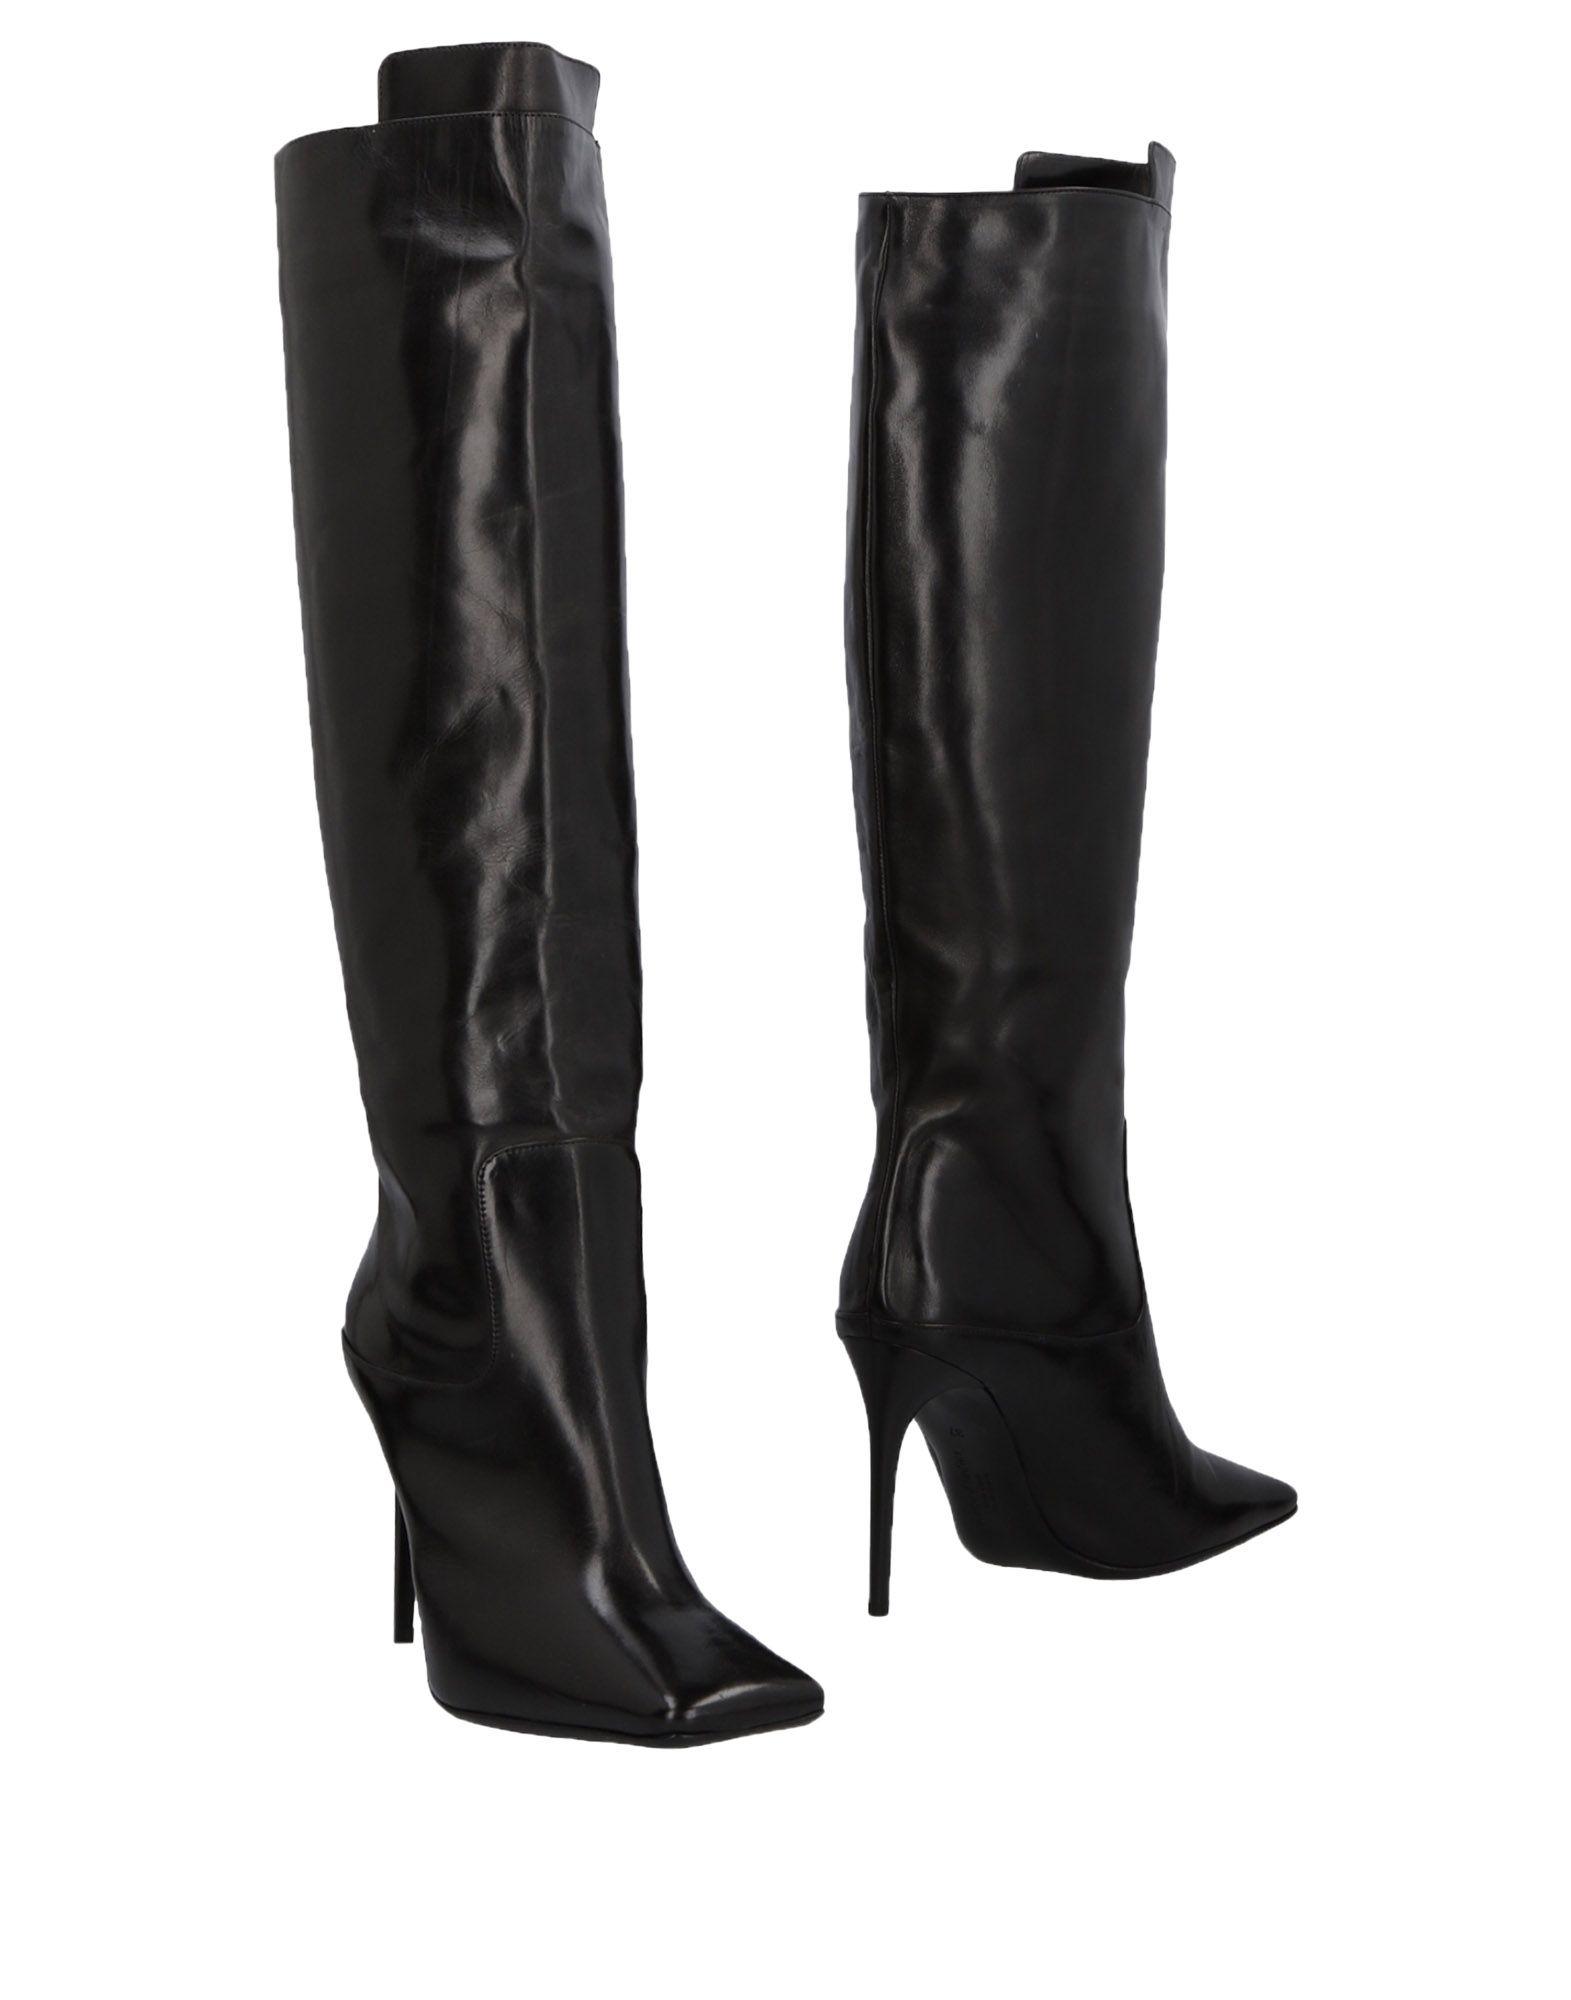 Acne Studios Stiefel Damen  11463725OI Beliebte Schuhe